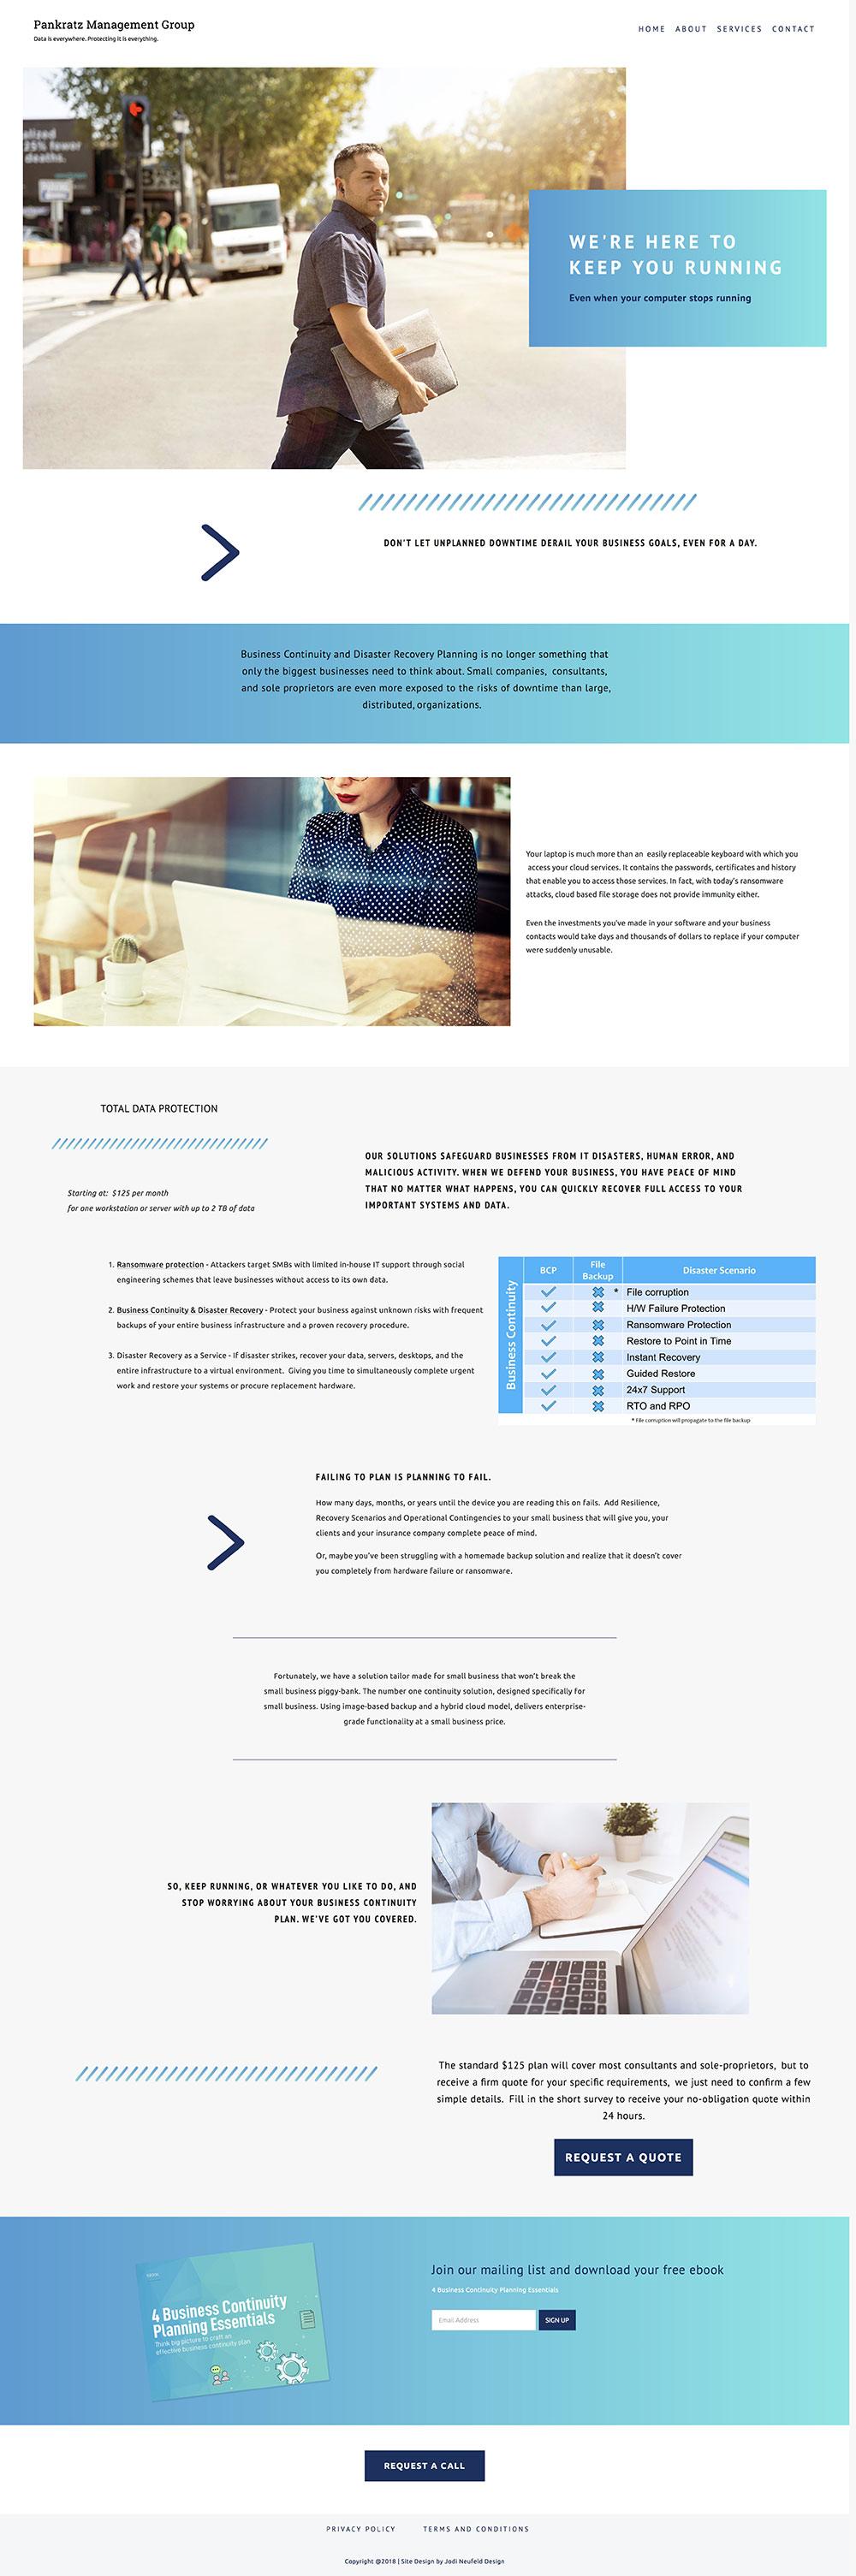 Pankratz Management Services page | Squarespace website design by Jodi Neufeld Design